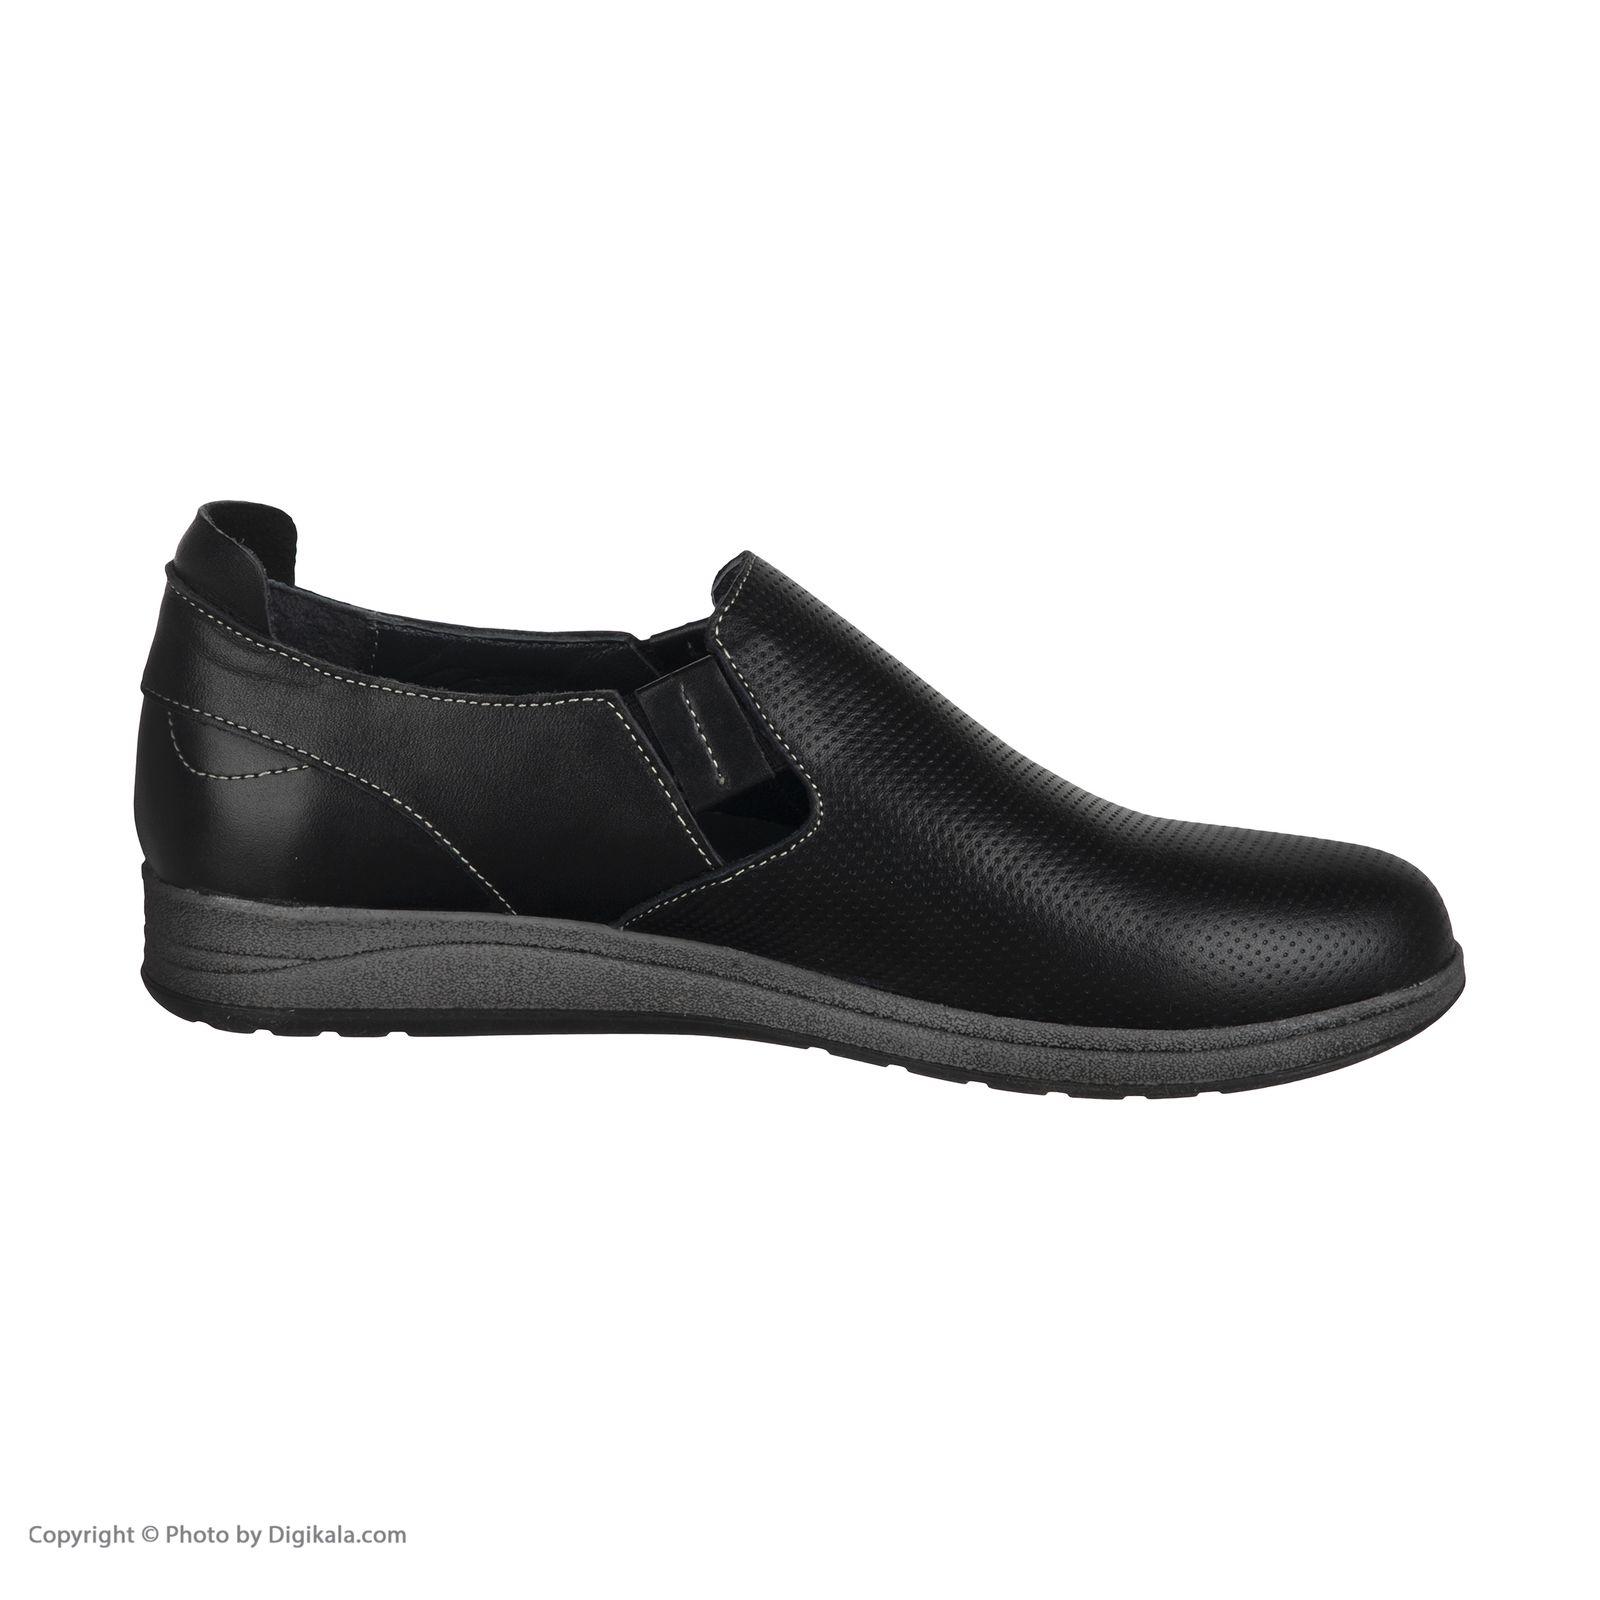 کفش روزمره زنانه سوته مدل 2958D500101 -  - 7